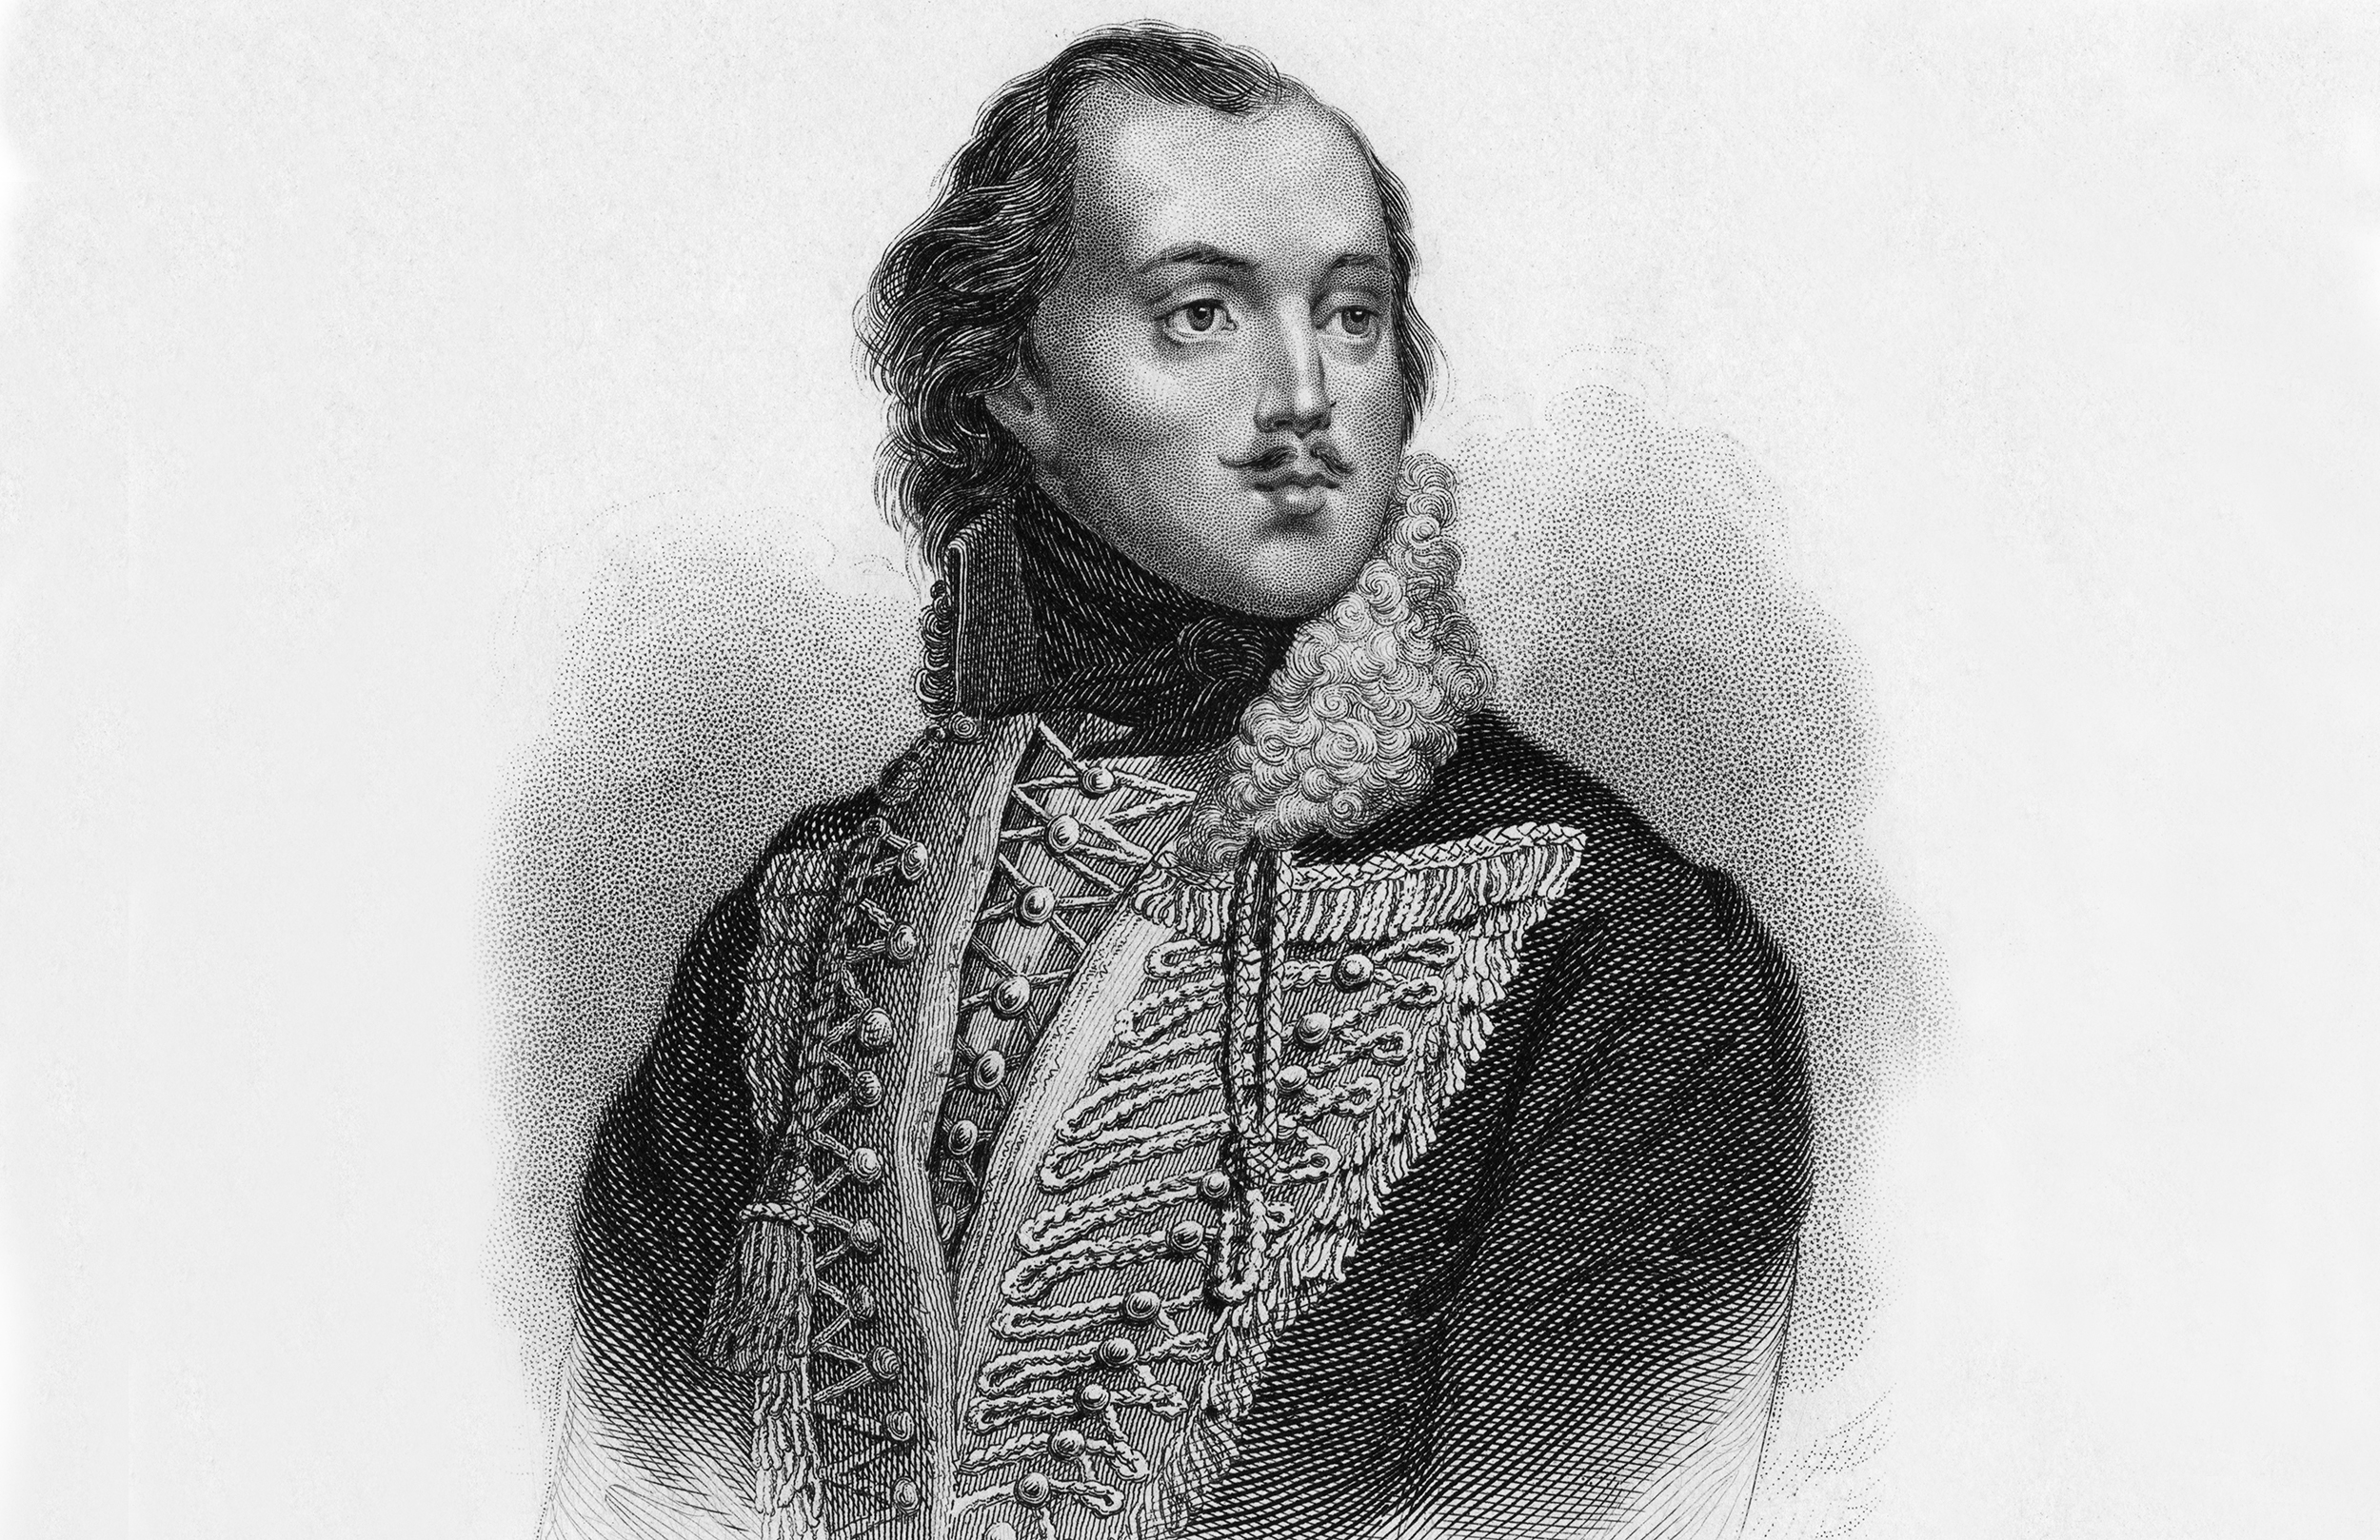 Revolutionary War Hero Casimir Pulaski Might Have Been A Woman Or Intersex